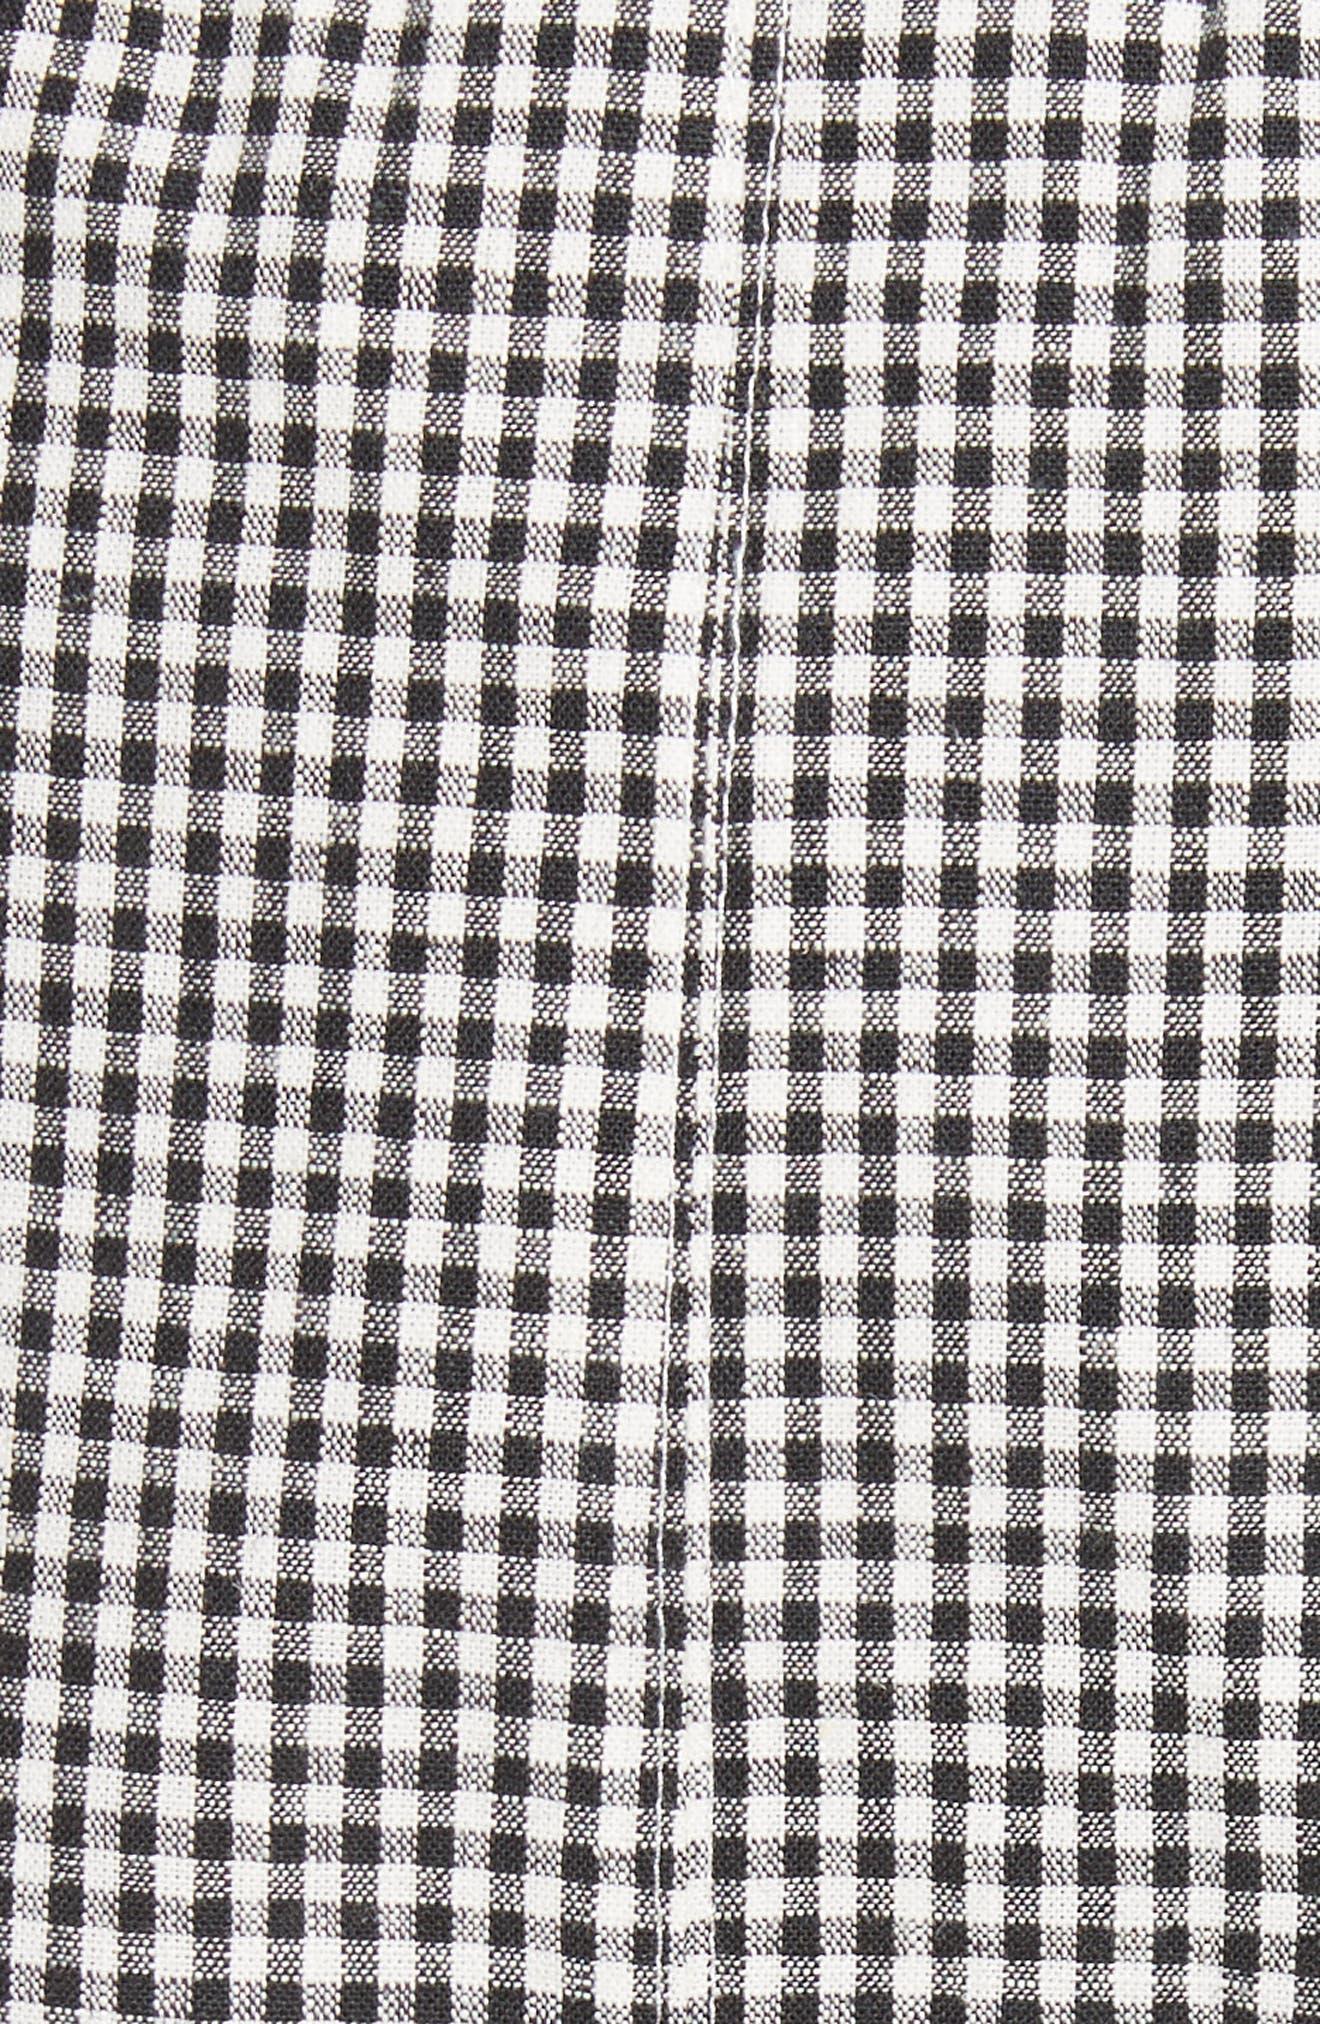 Uniform Gingham Linen & Cotton Skirt,                             Alternate thumbnail 5, color,                             004